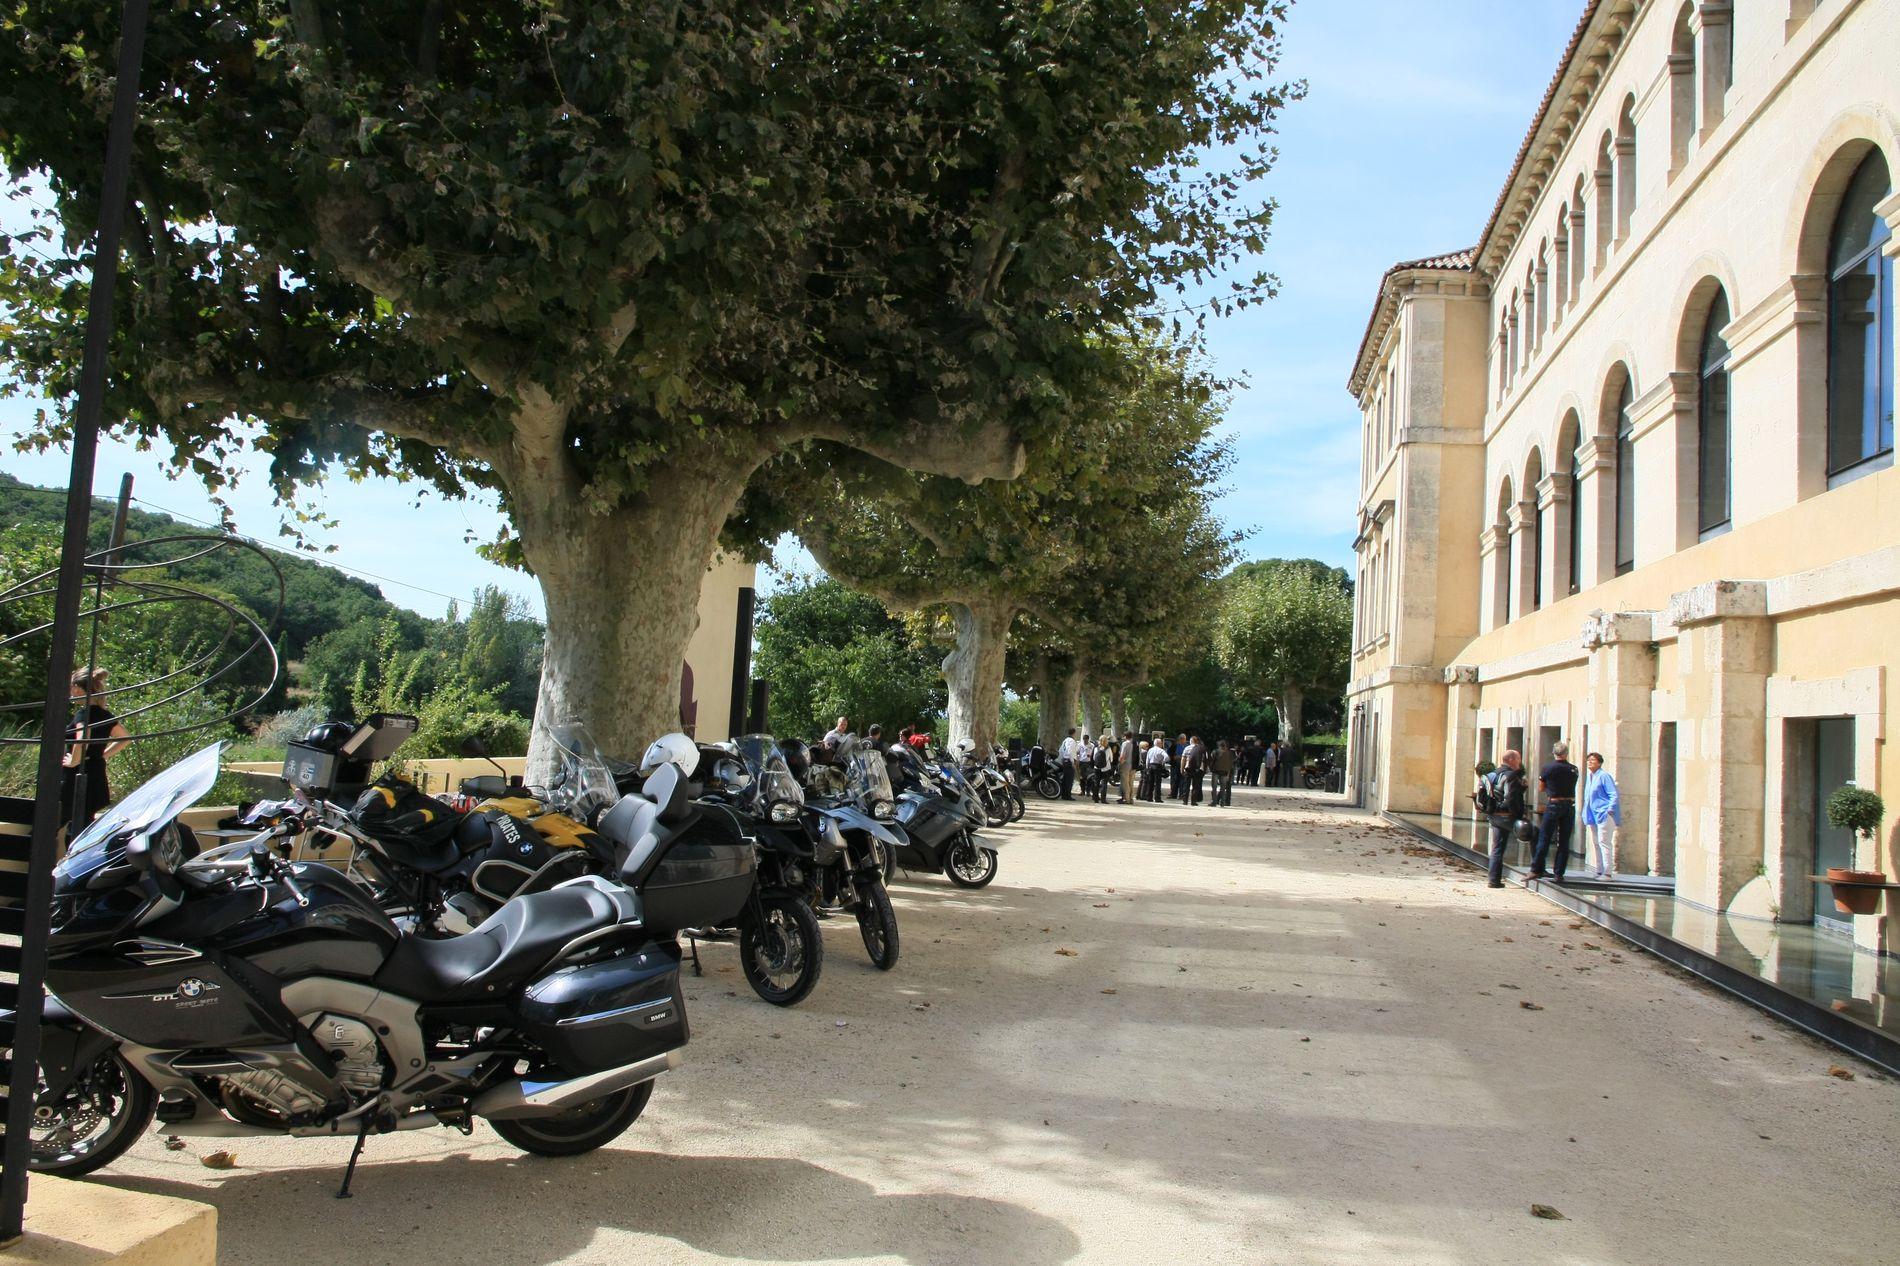 Balade moto dans la Drôme le 22 septembre 2013 - medium